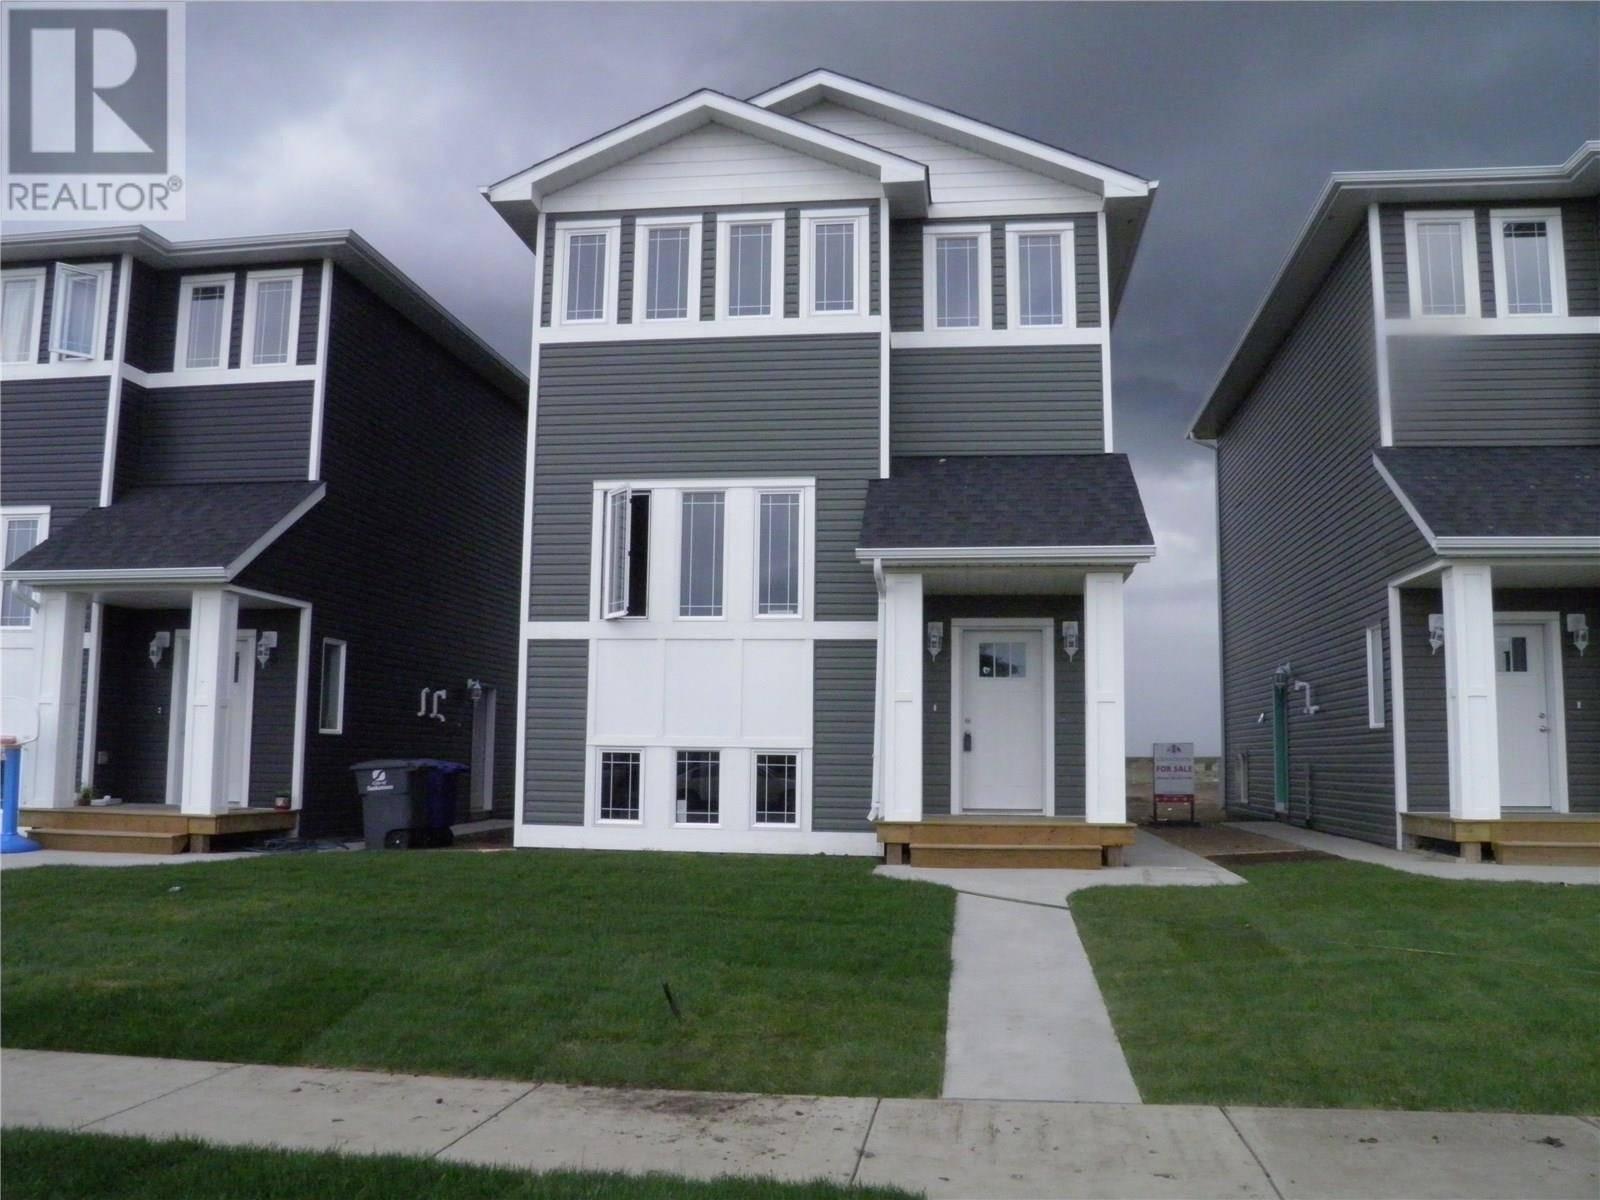 House for sale at 2026 Kensington Rd Saskatoon Saskatchewan - MLS: SK777395